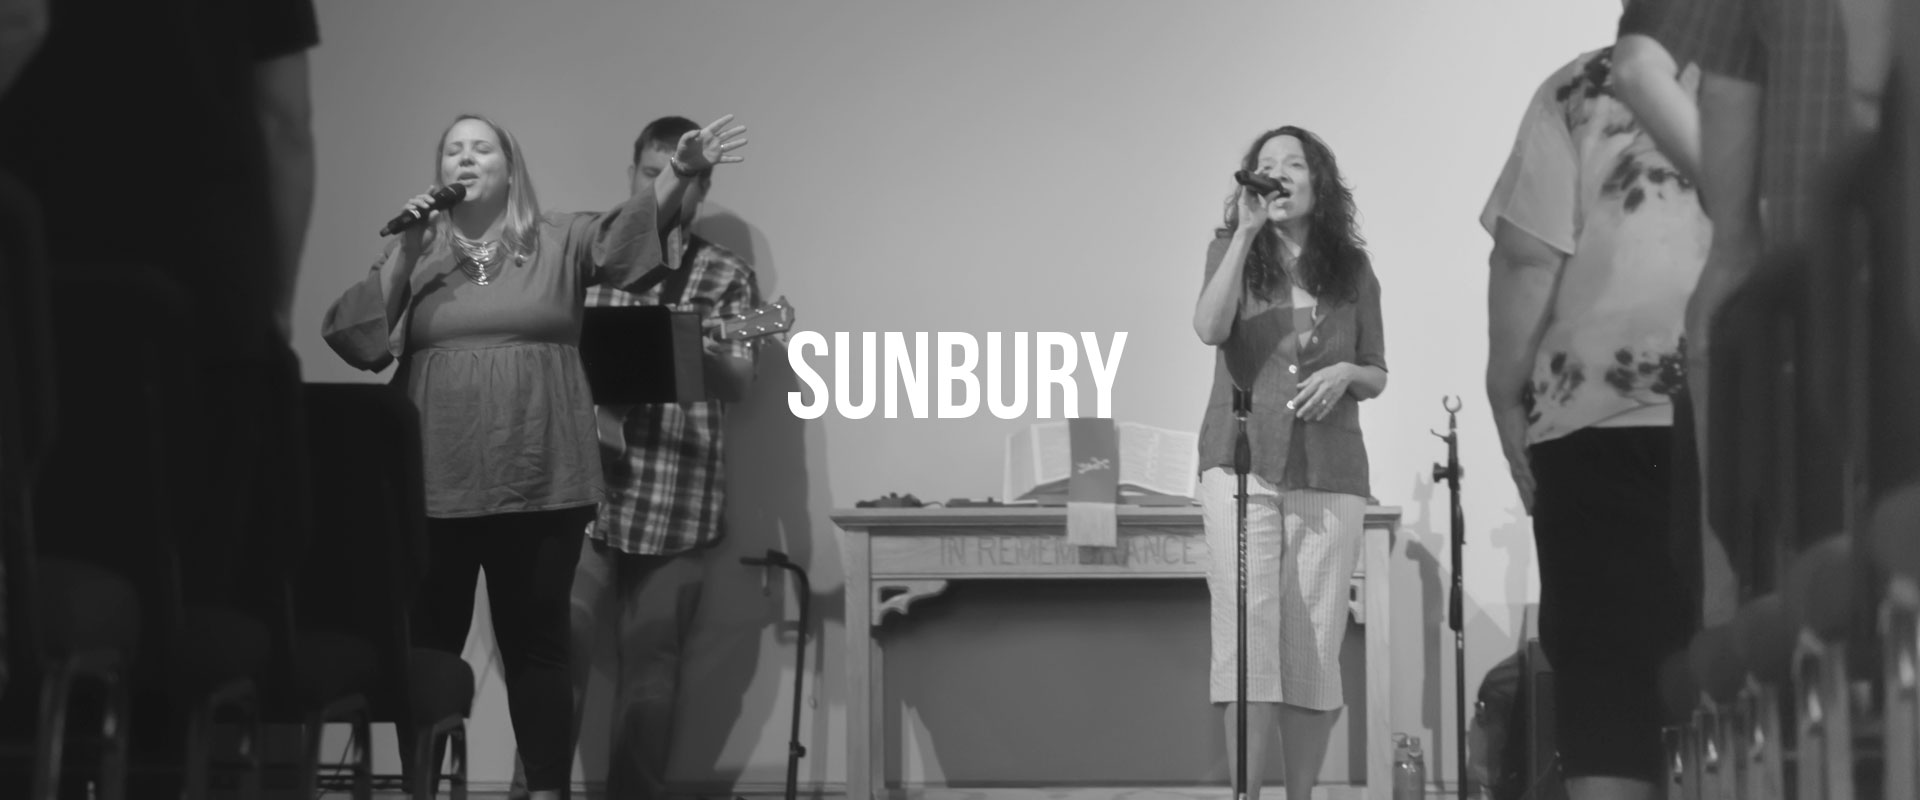 sunbury-header